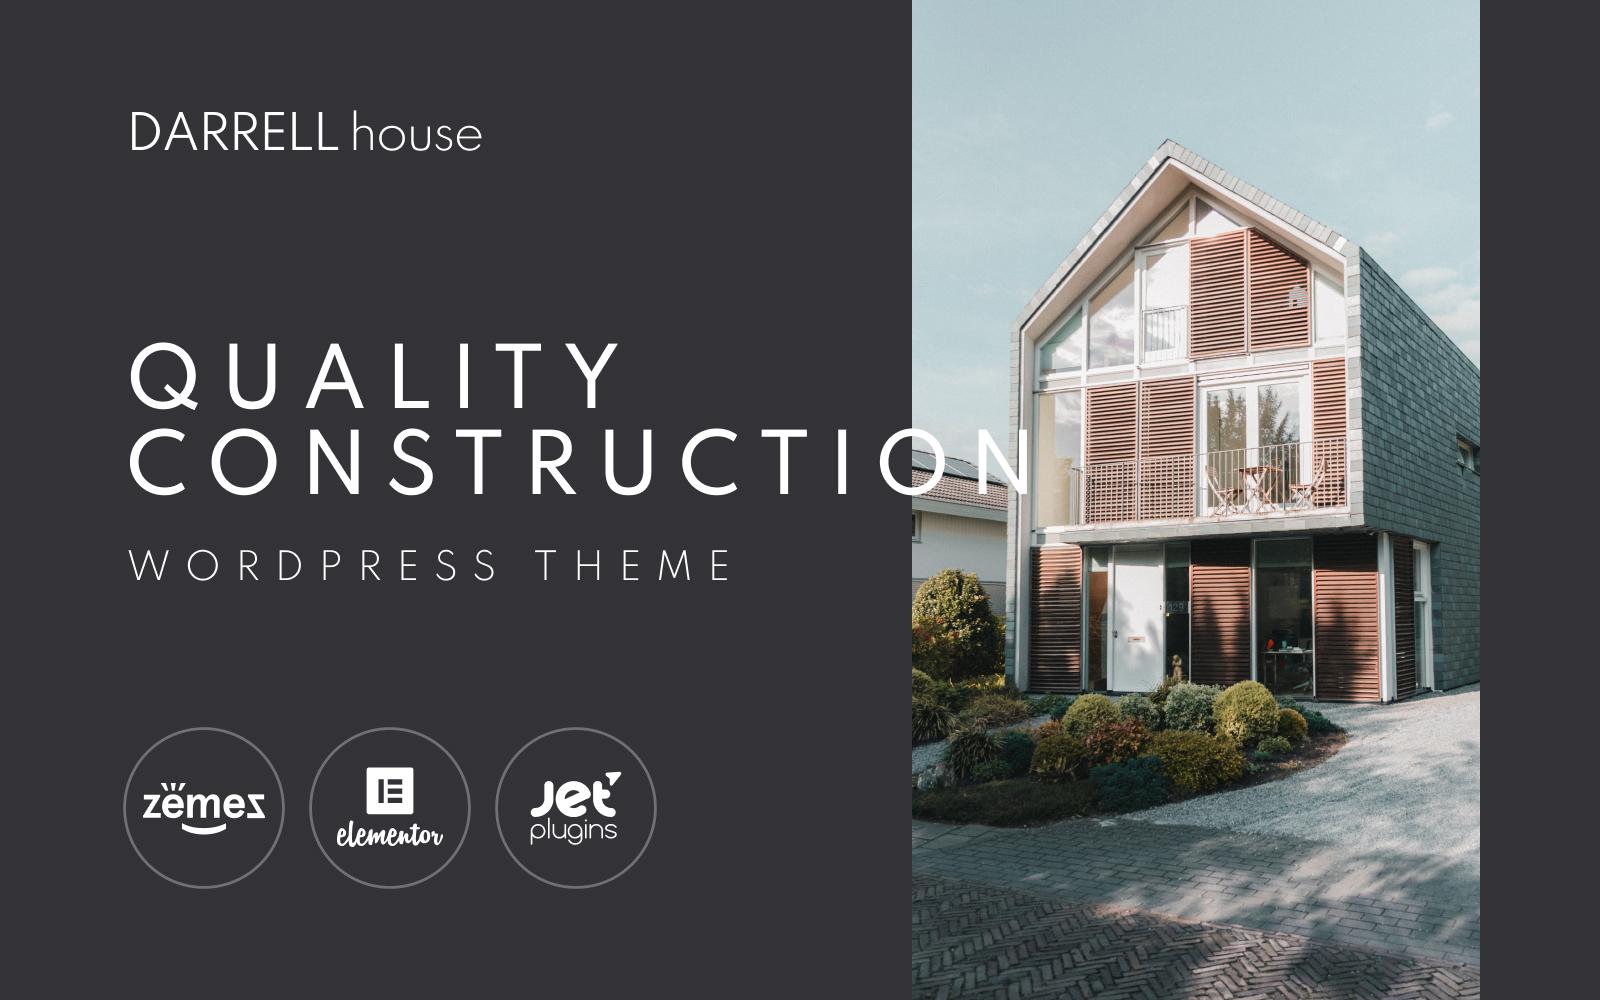 Darrell house - Quality Construction WordPress Theme